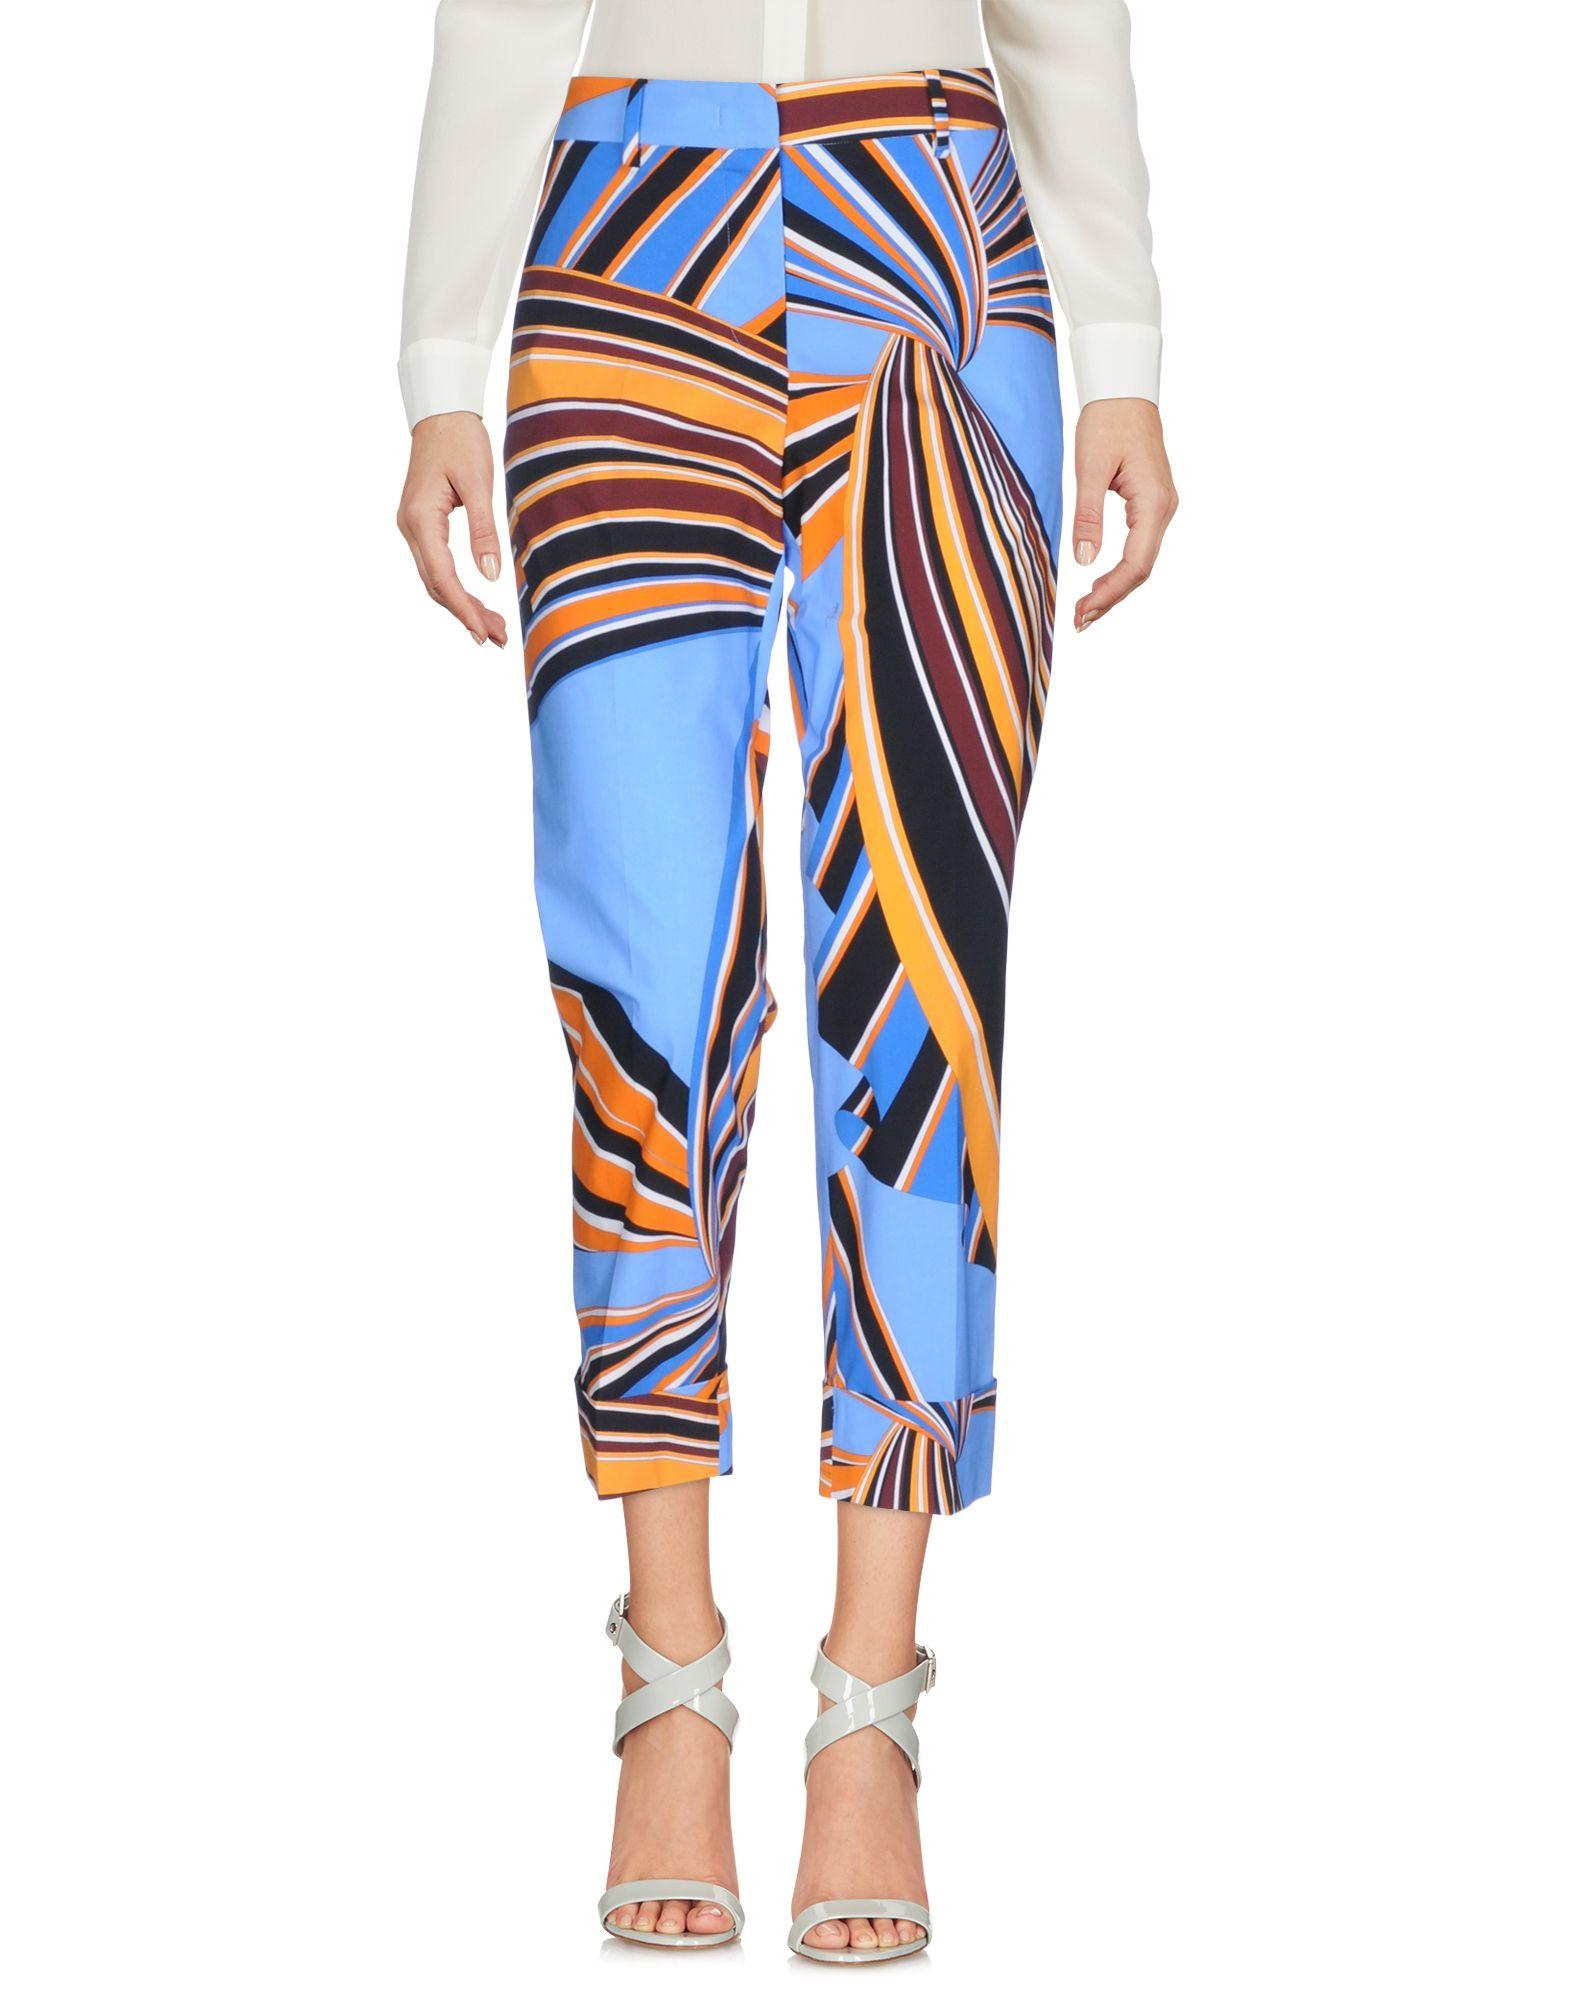 Pantalone Emilio Pucci Donna - Acquista online su Vatqzuv